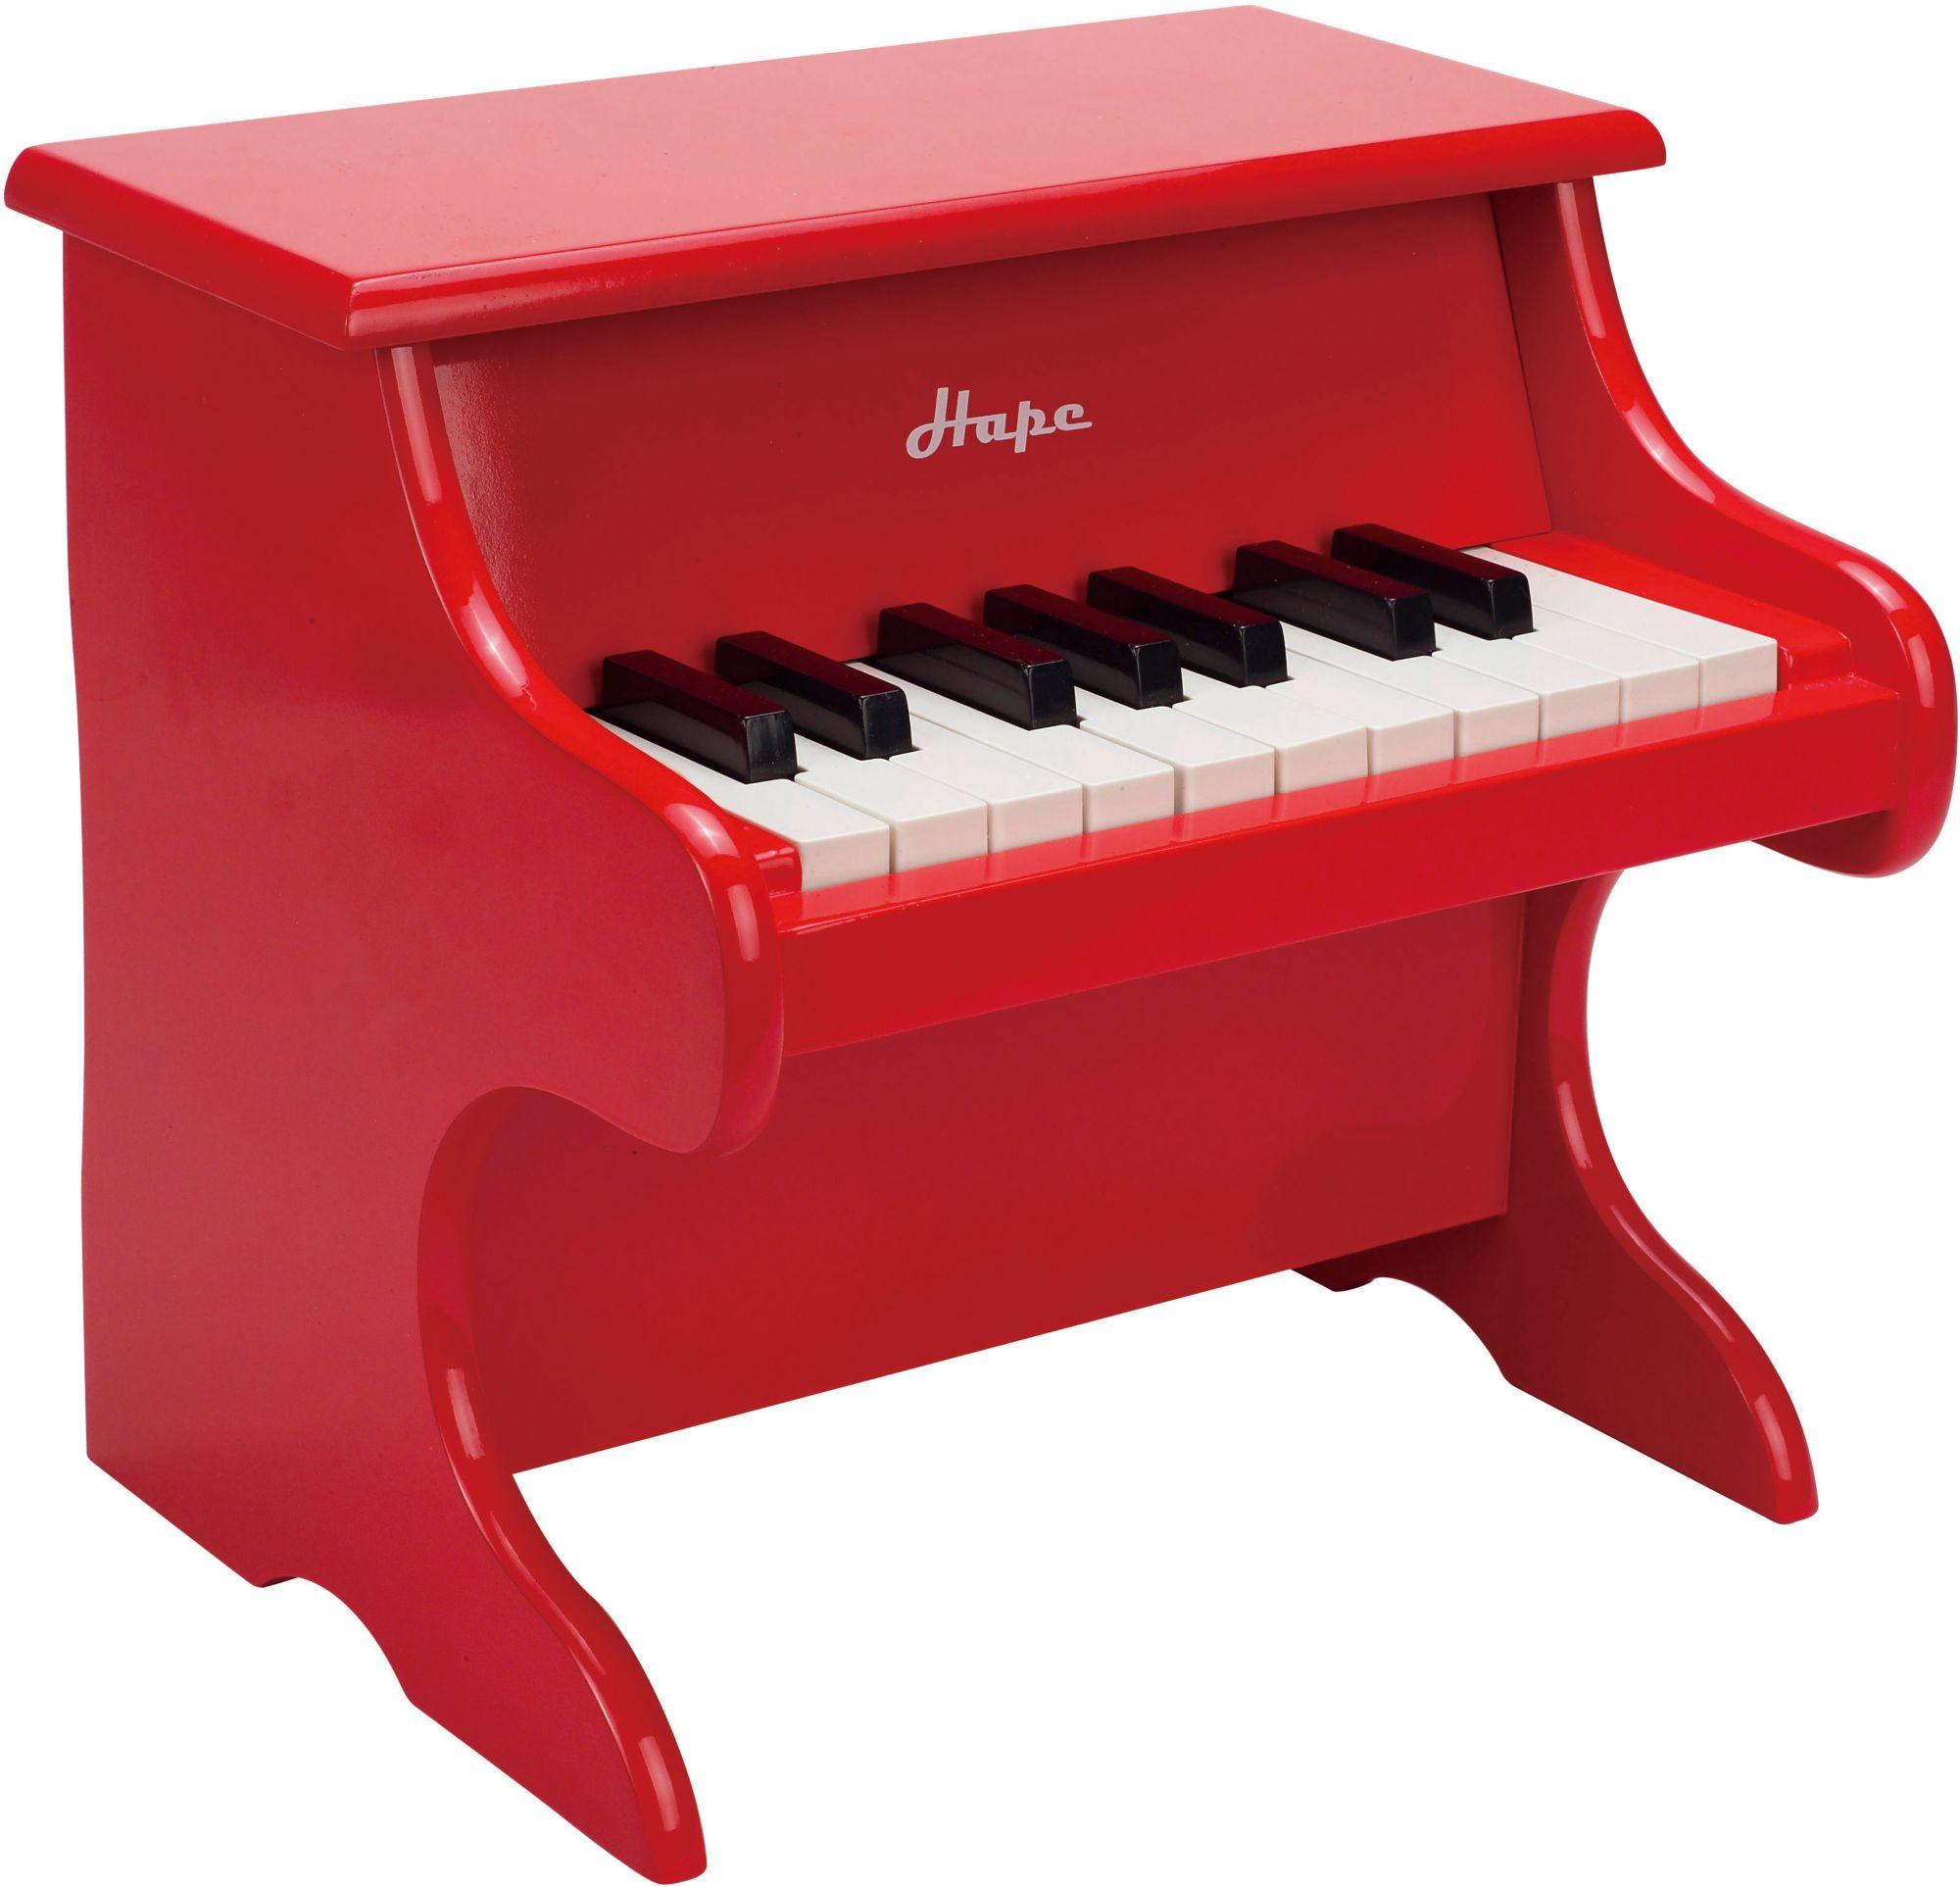 HAPE Hape Kindermusikinstrument, »Spielzeugklavier«